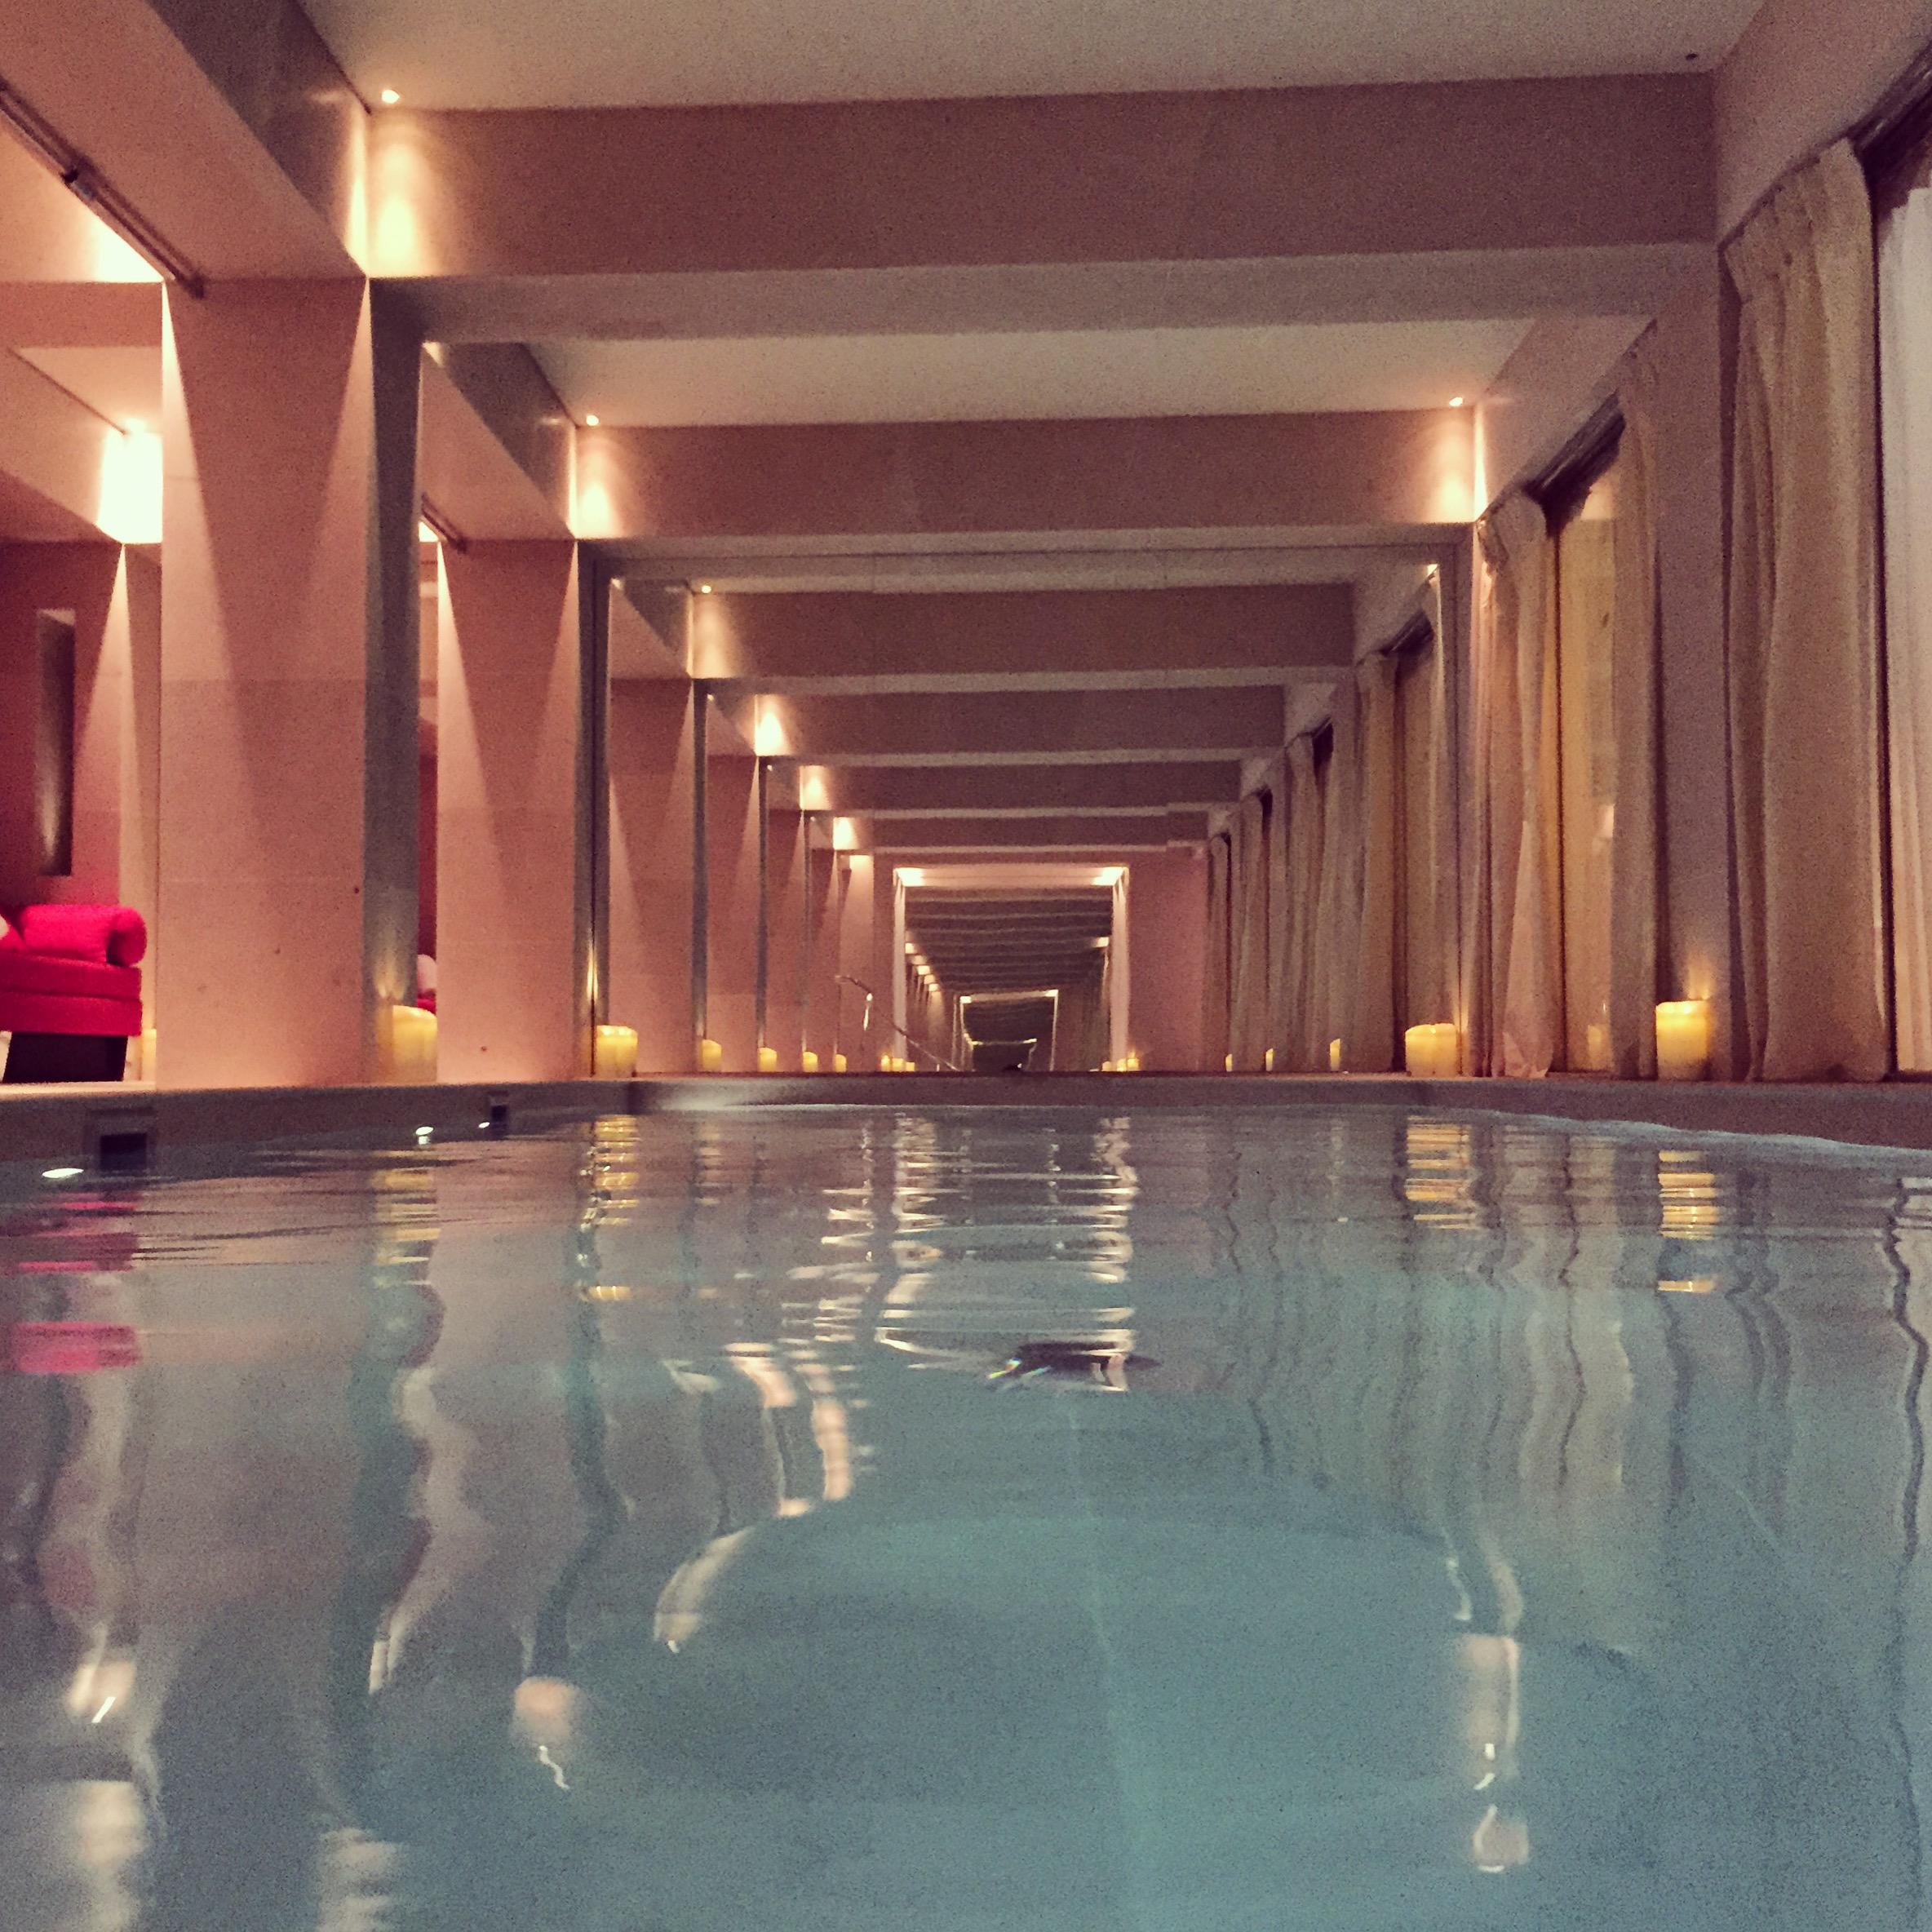 la_reserve_paris_hotel_pool_fancyoli